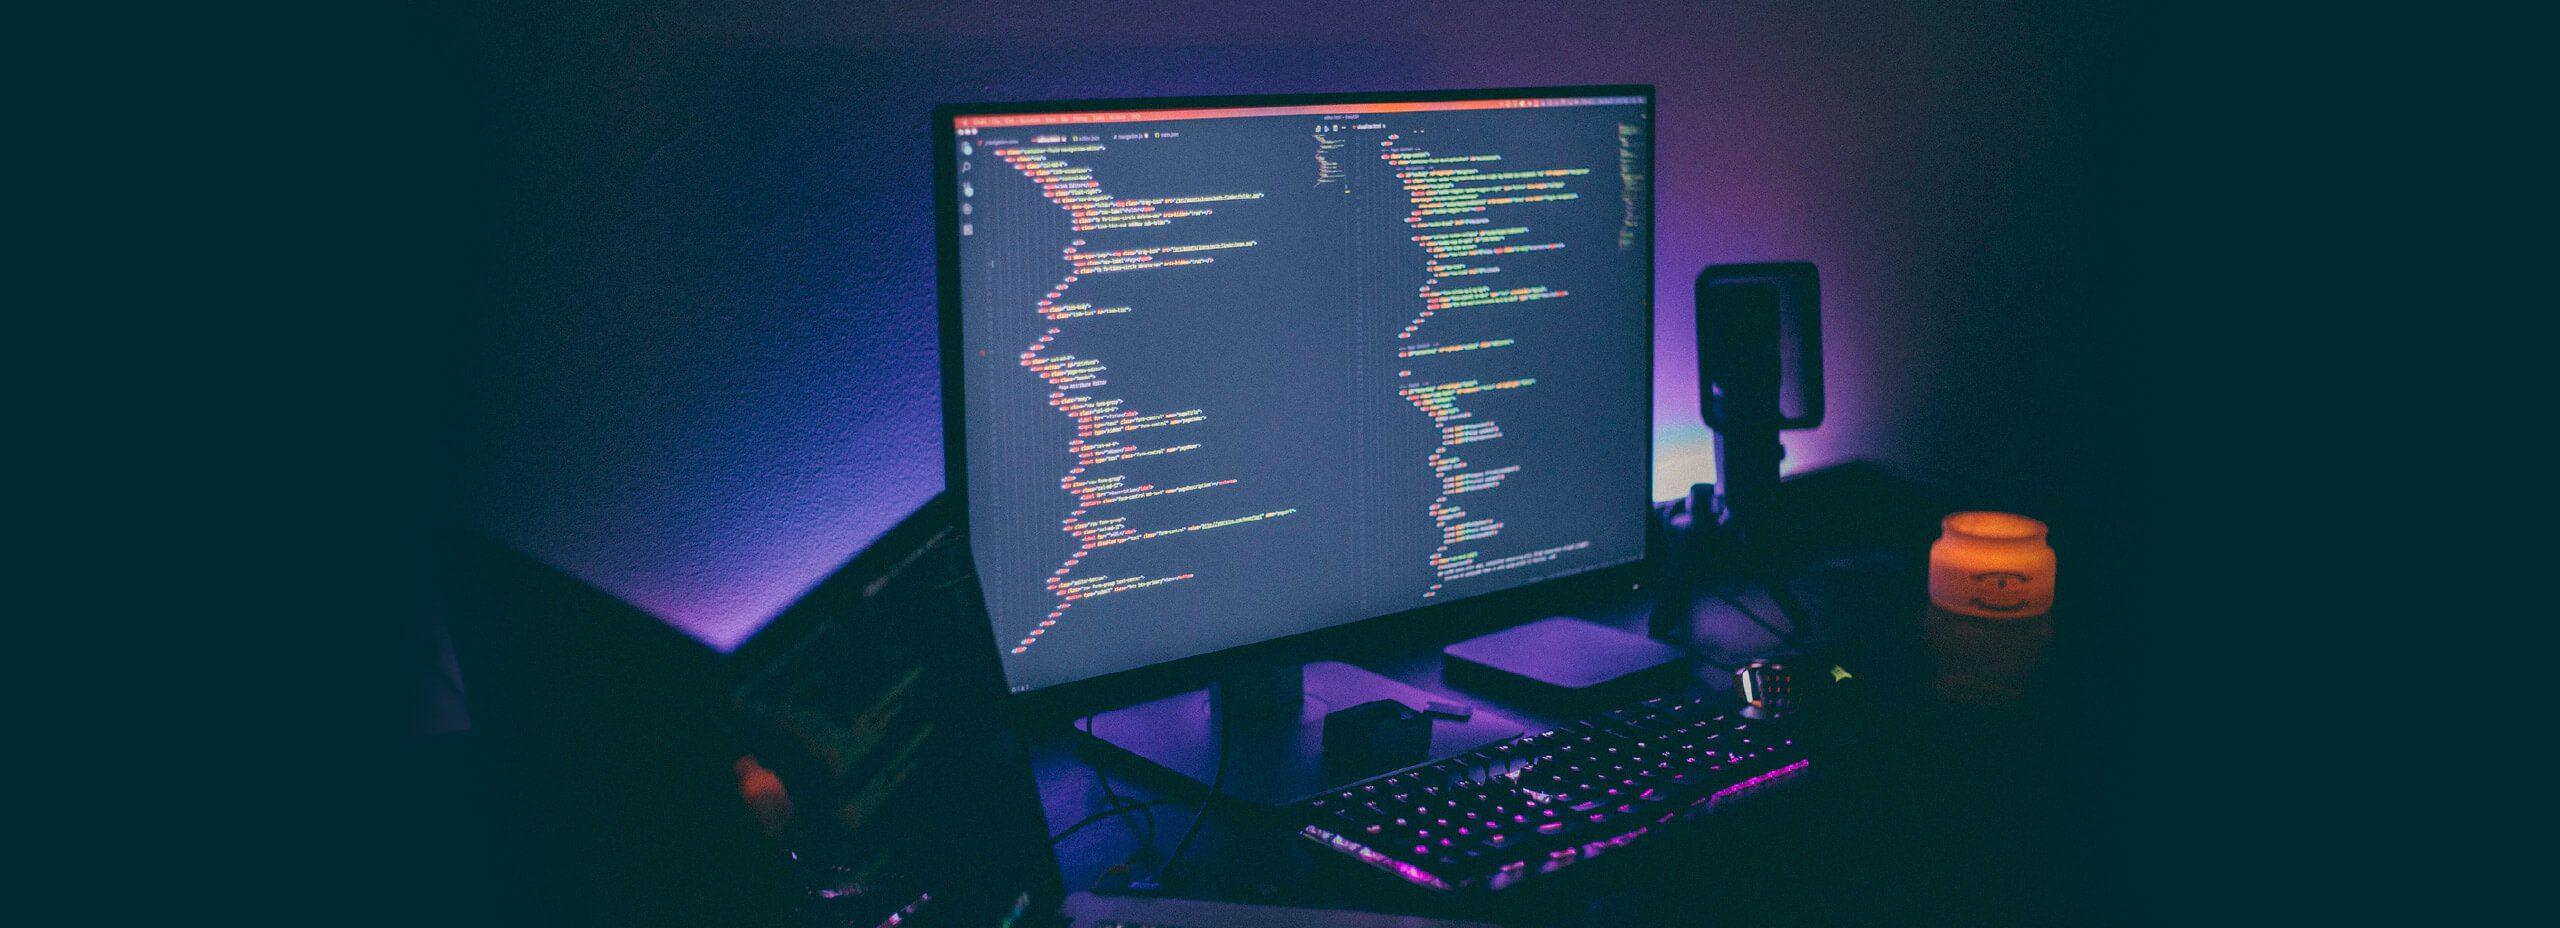 Customer Care & Billing Systems – Application Development